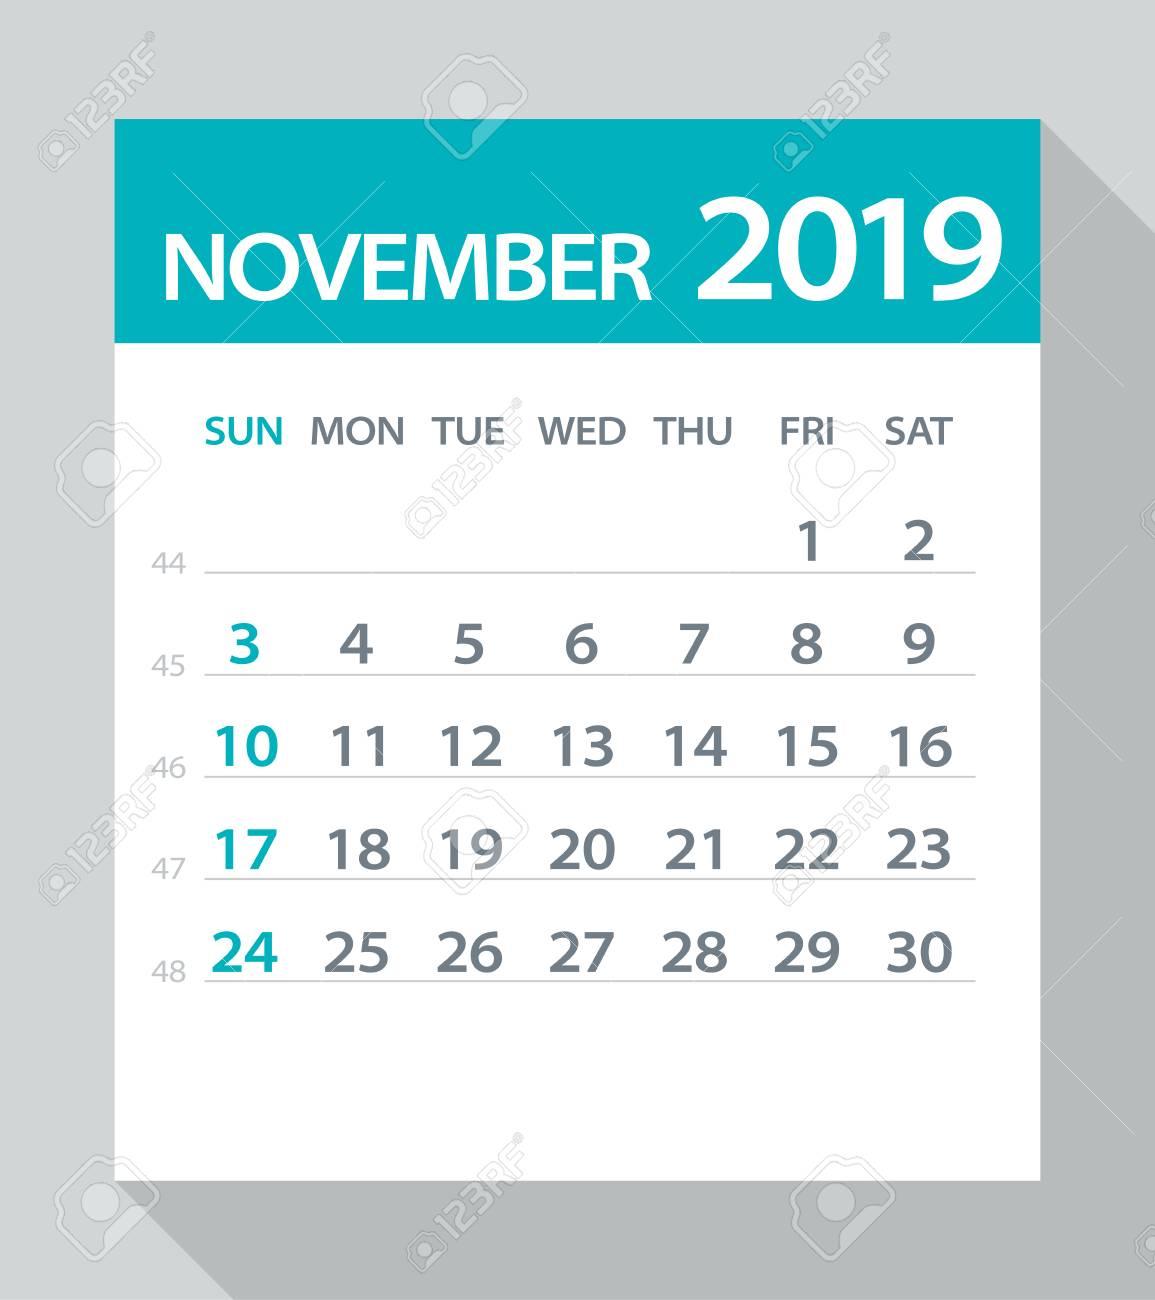 November 2019 Calendar Clipart  Yatay.horizonconsulting.co within November Calendar Clipart Free